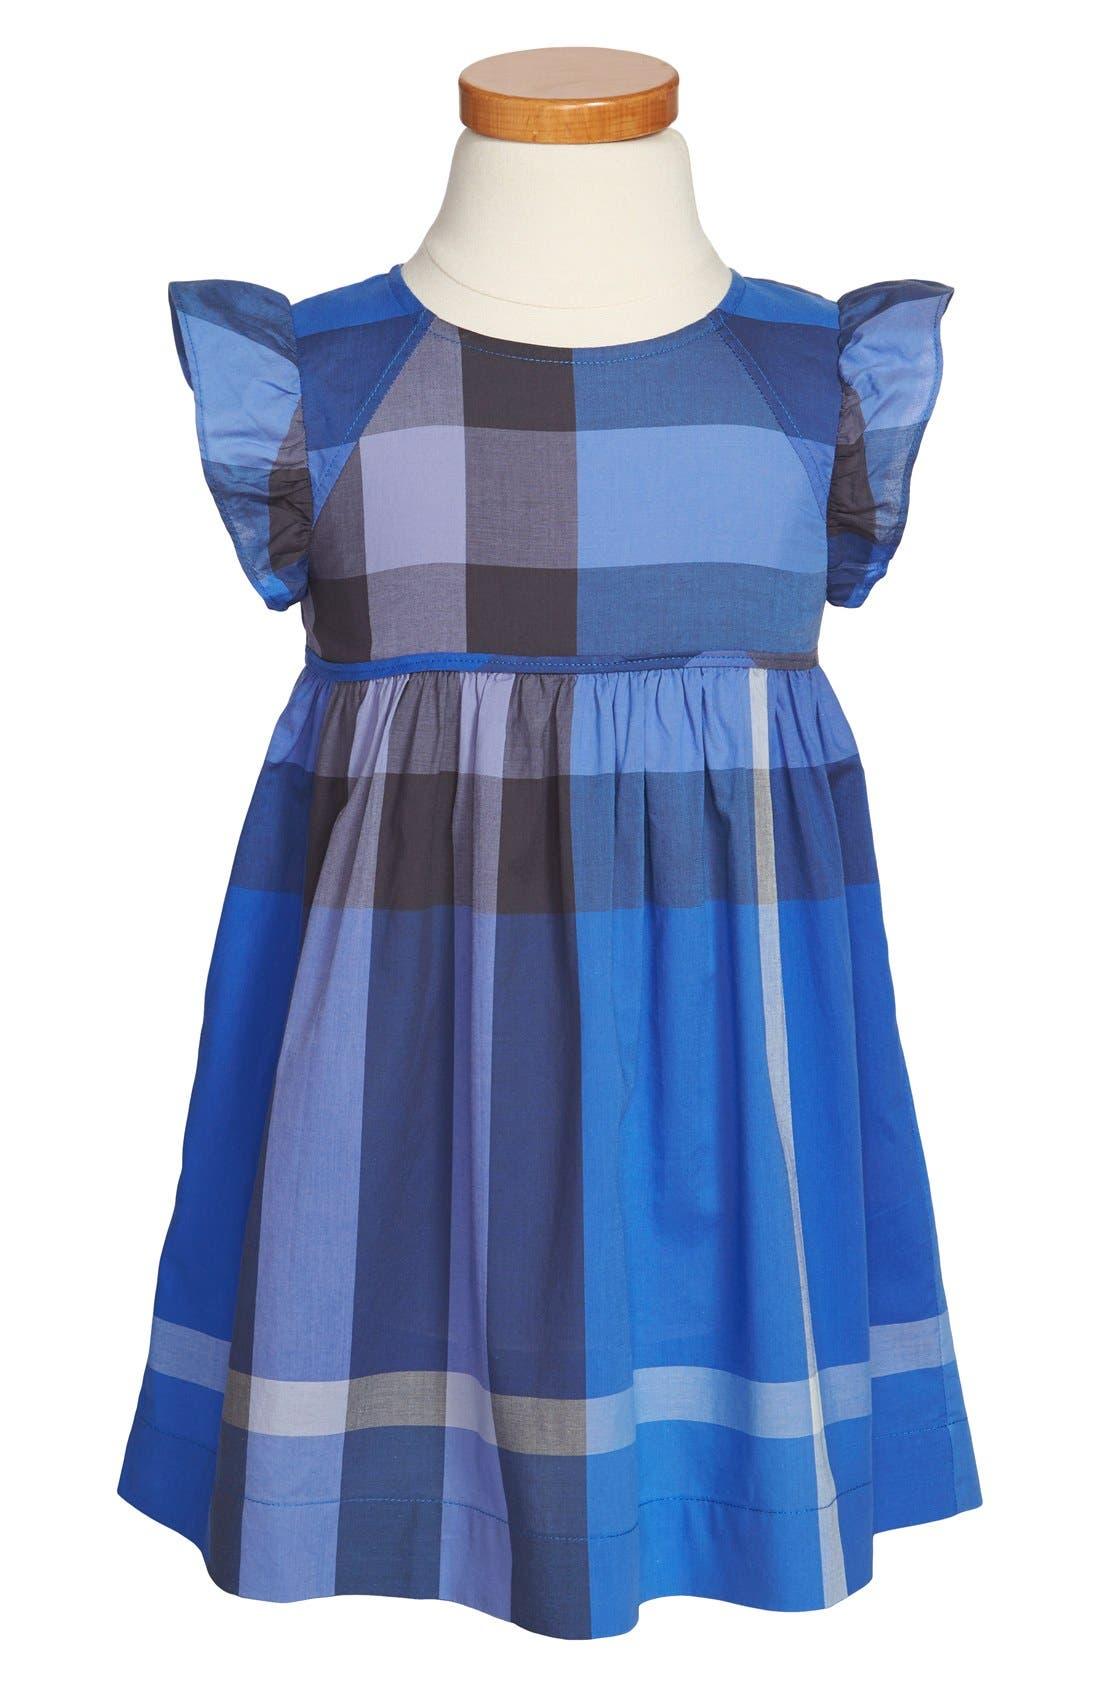 Alternate Image 1 Selected - Burberry Flutter Sleeve Dress (Toddler Girls)